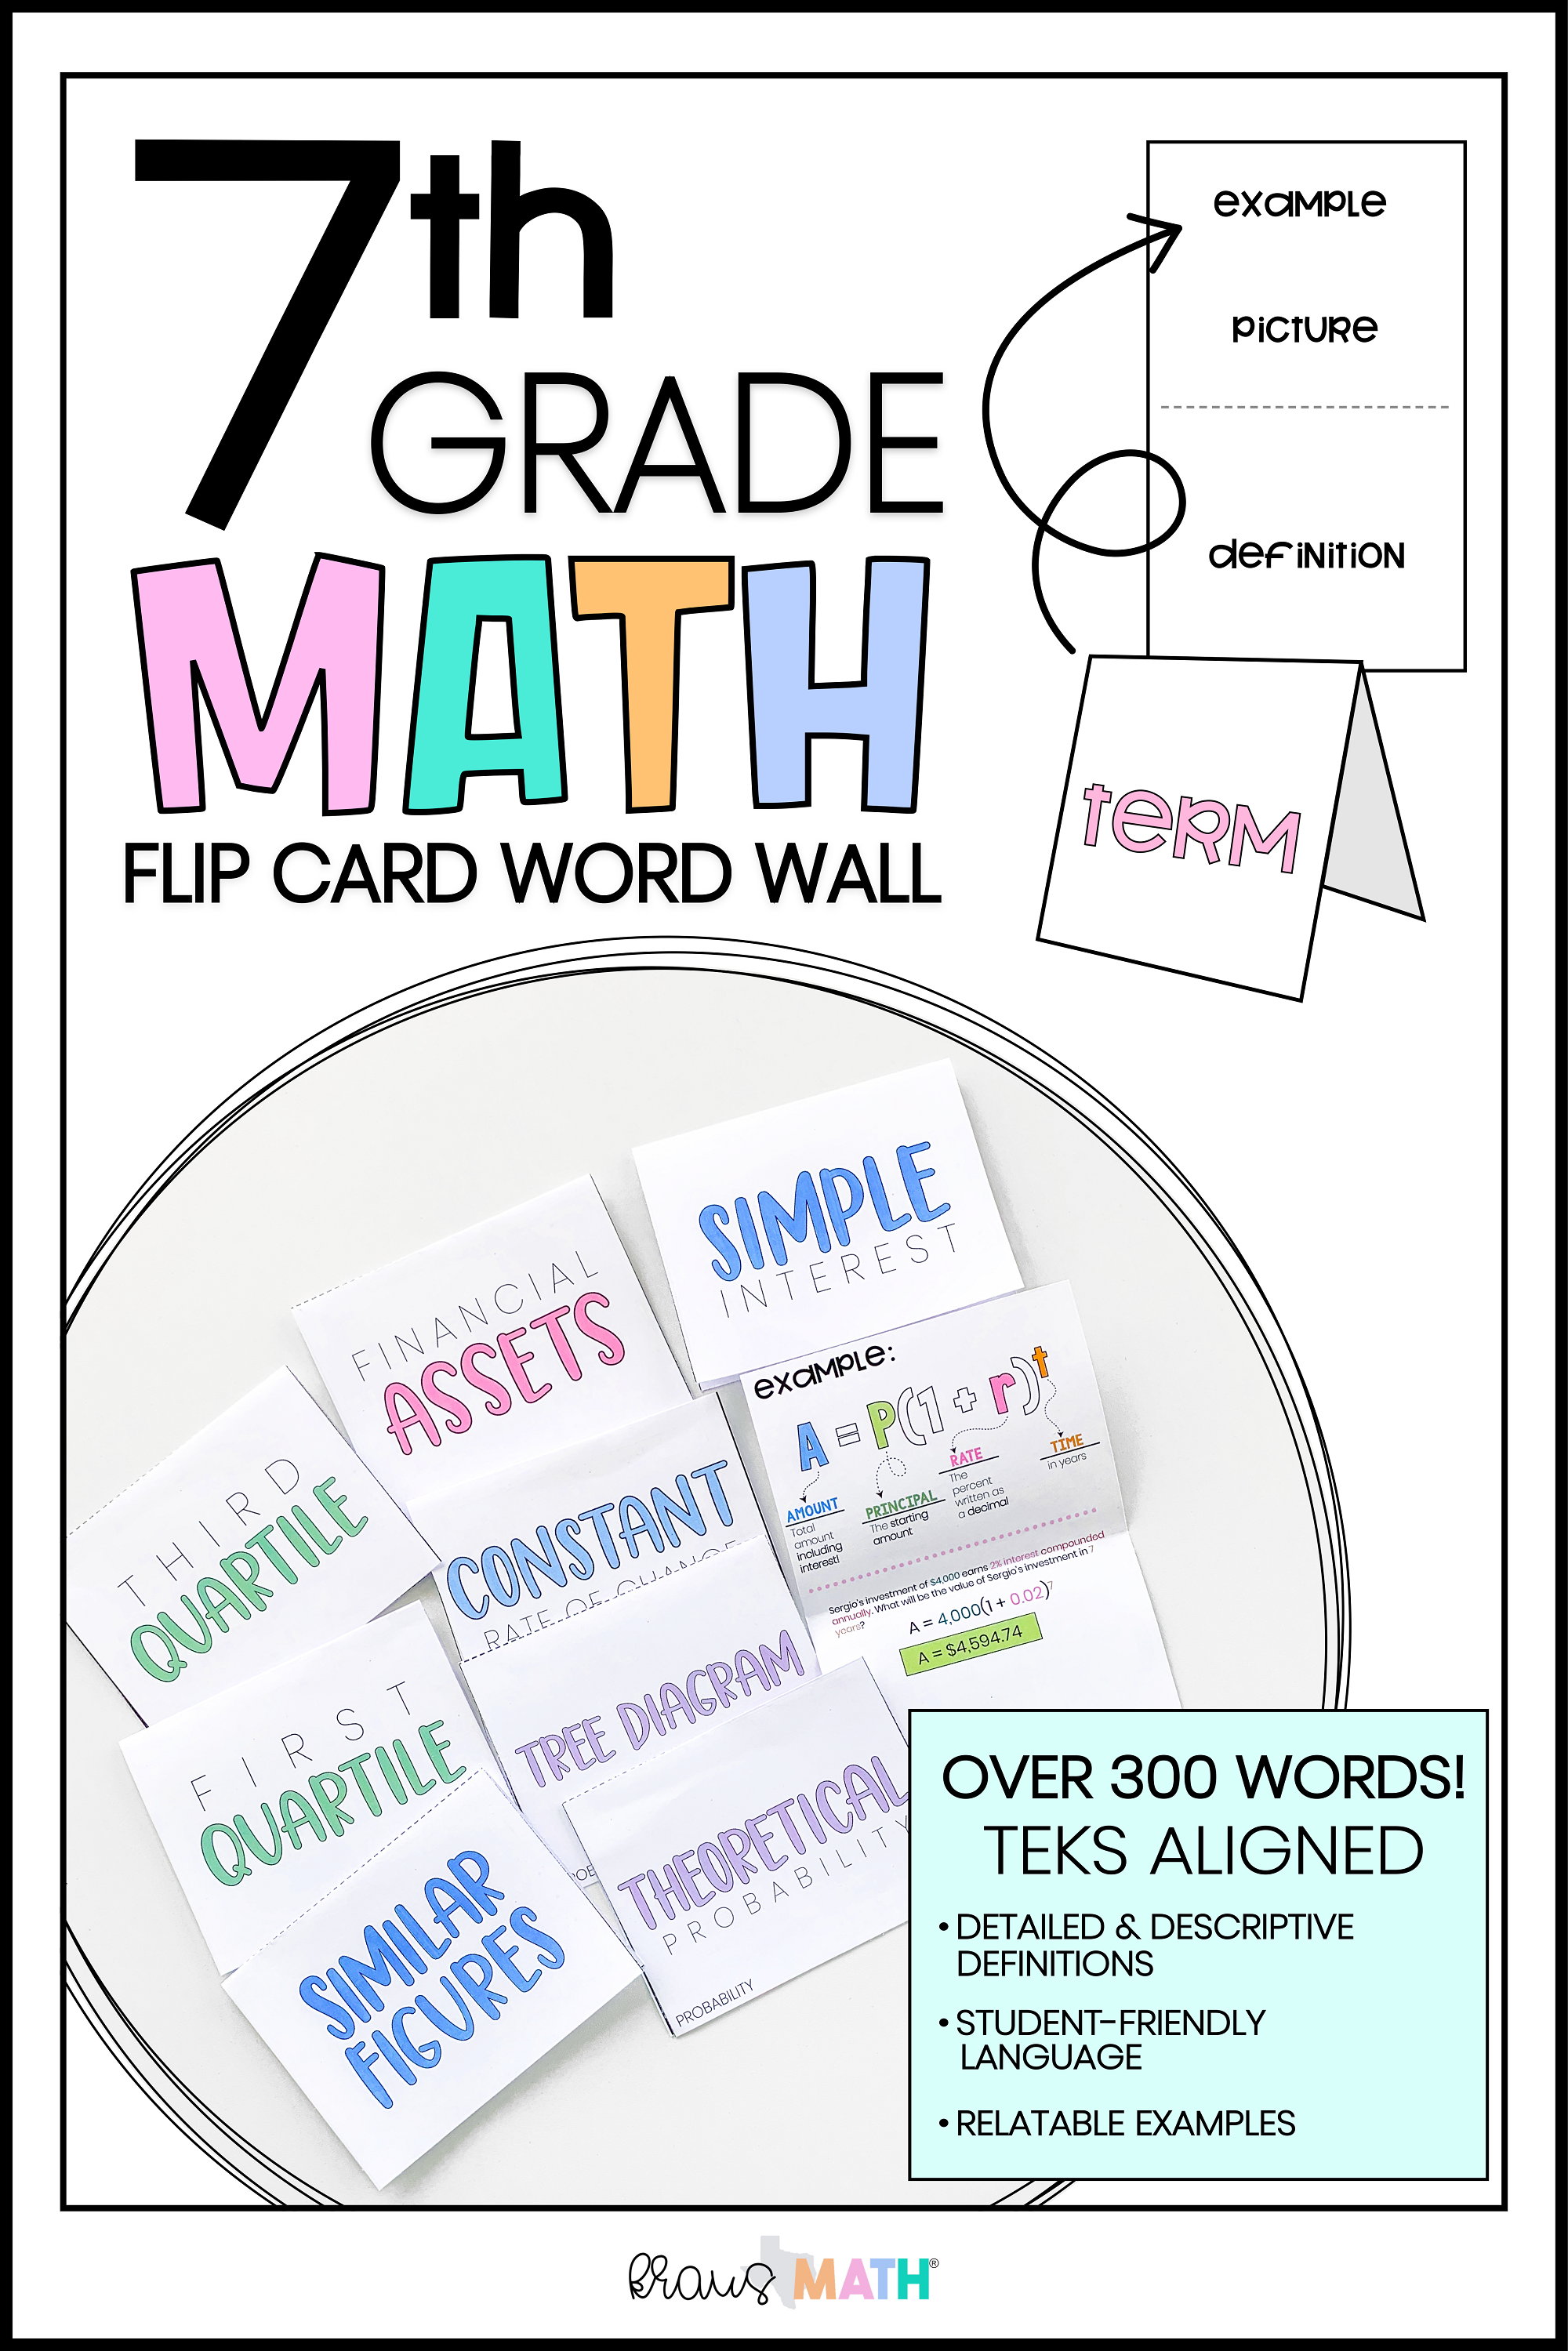 7th Grade Math FLIP CARD Word Wall   Kraus Math   7th grade math [ 2999 x 2000 Pixel ]